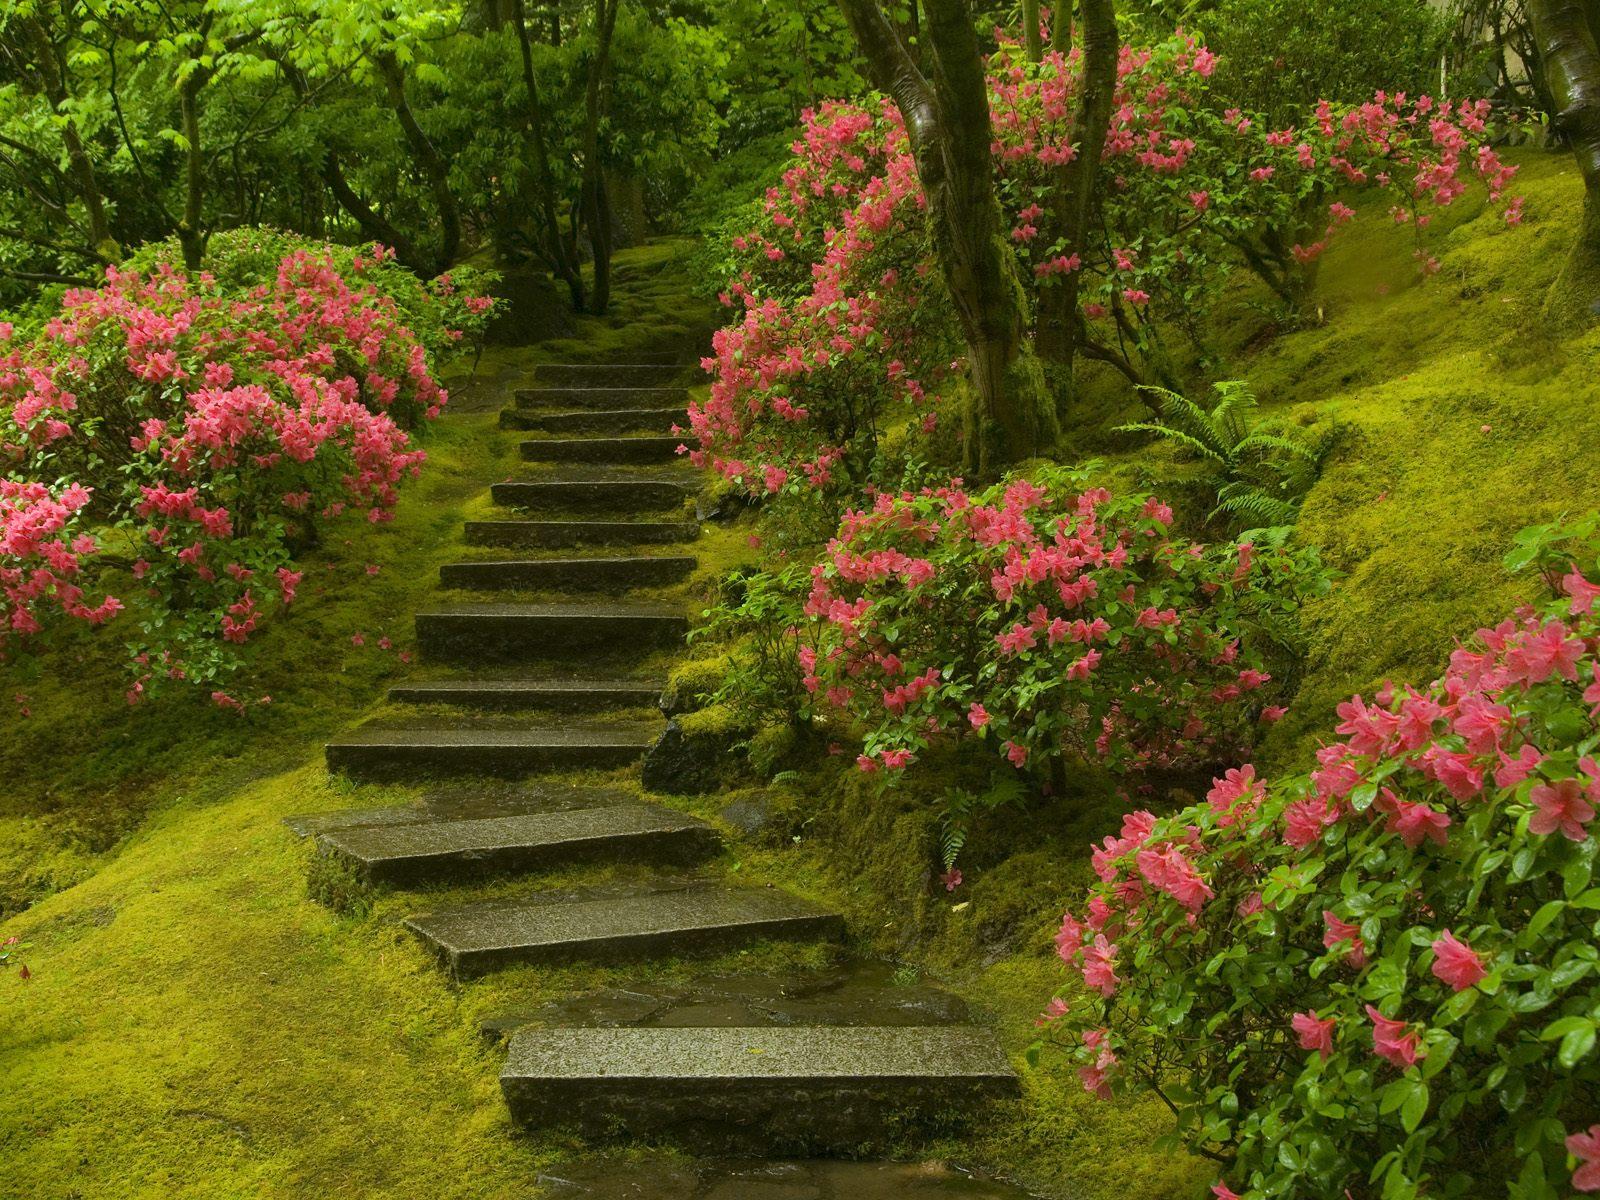 Japanese Garden Washington Park Wallpapers | HD Wallpapers